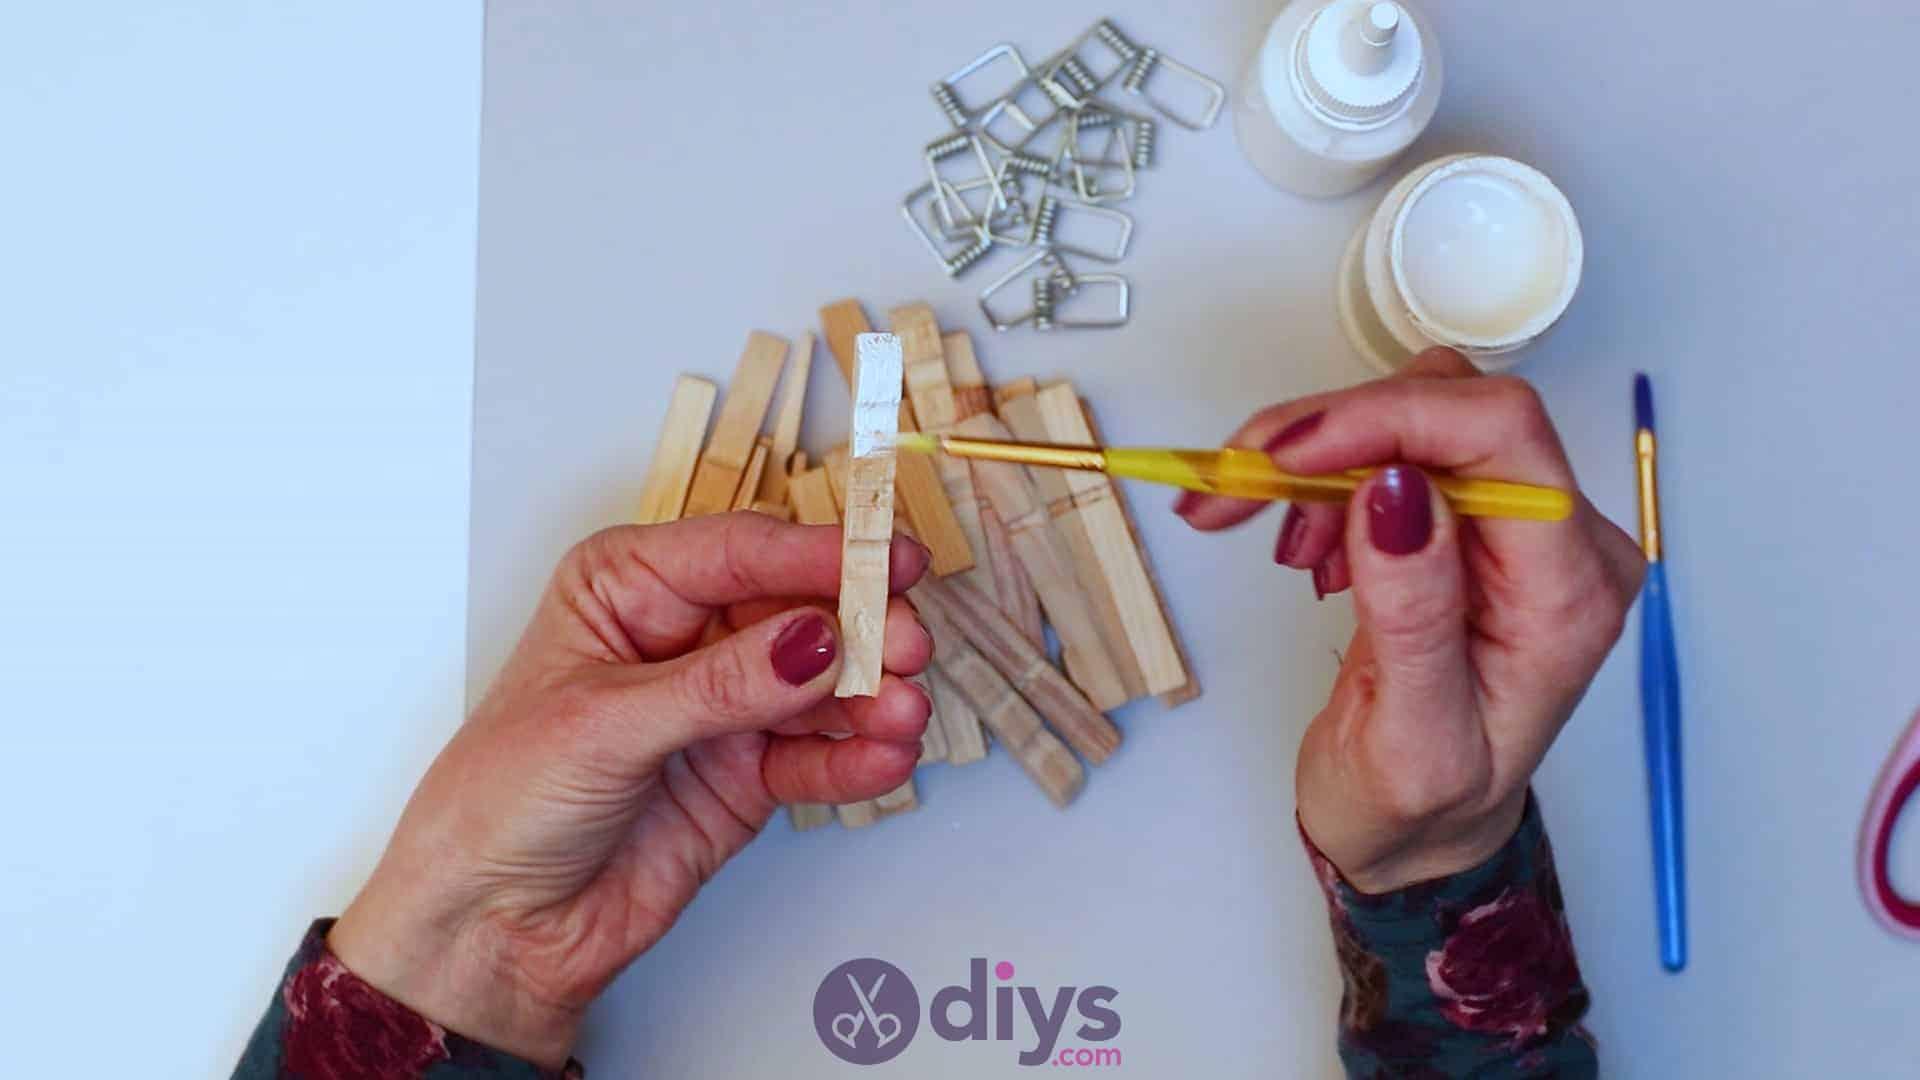 Diy clothespin napkin holder step 3a